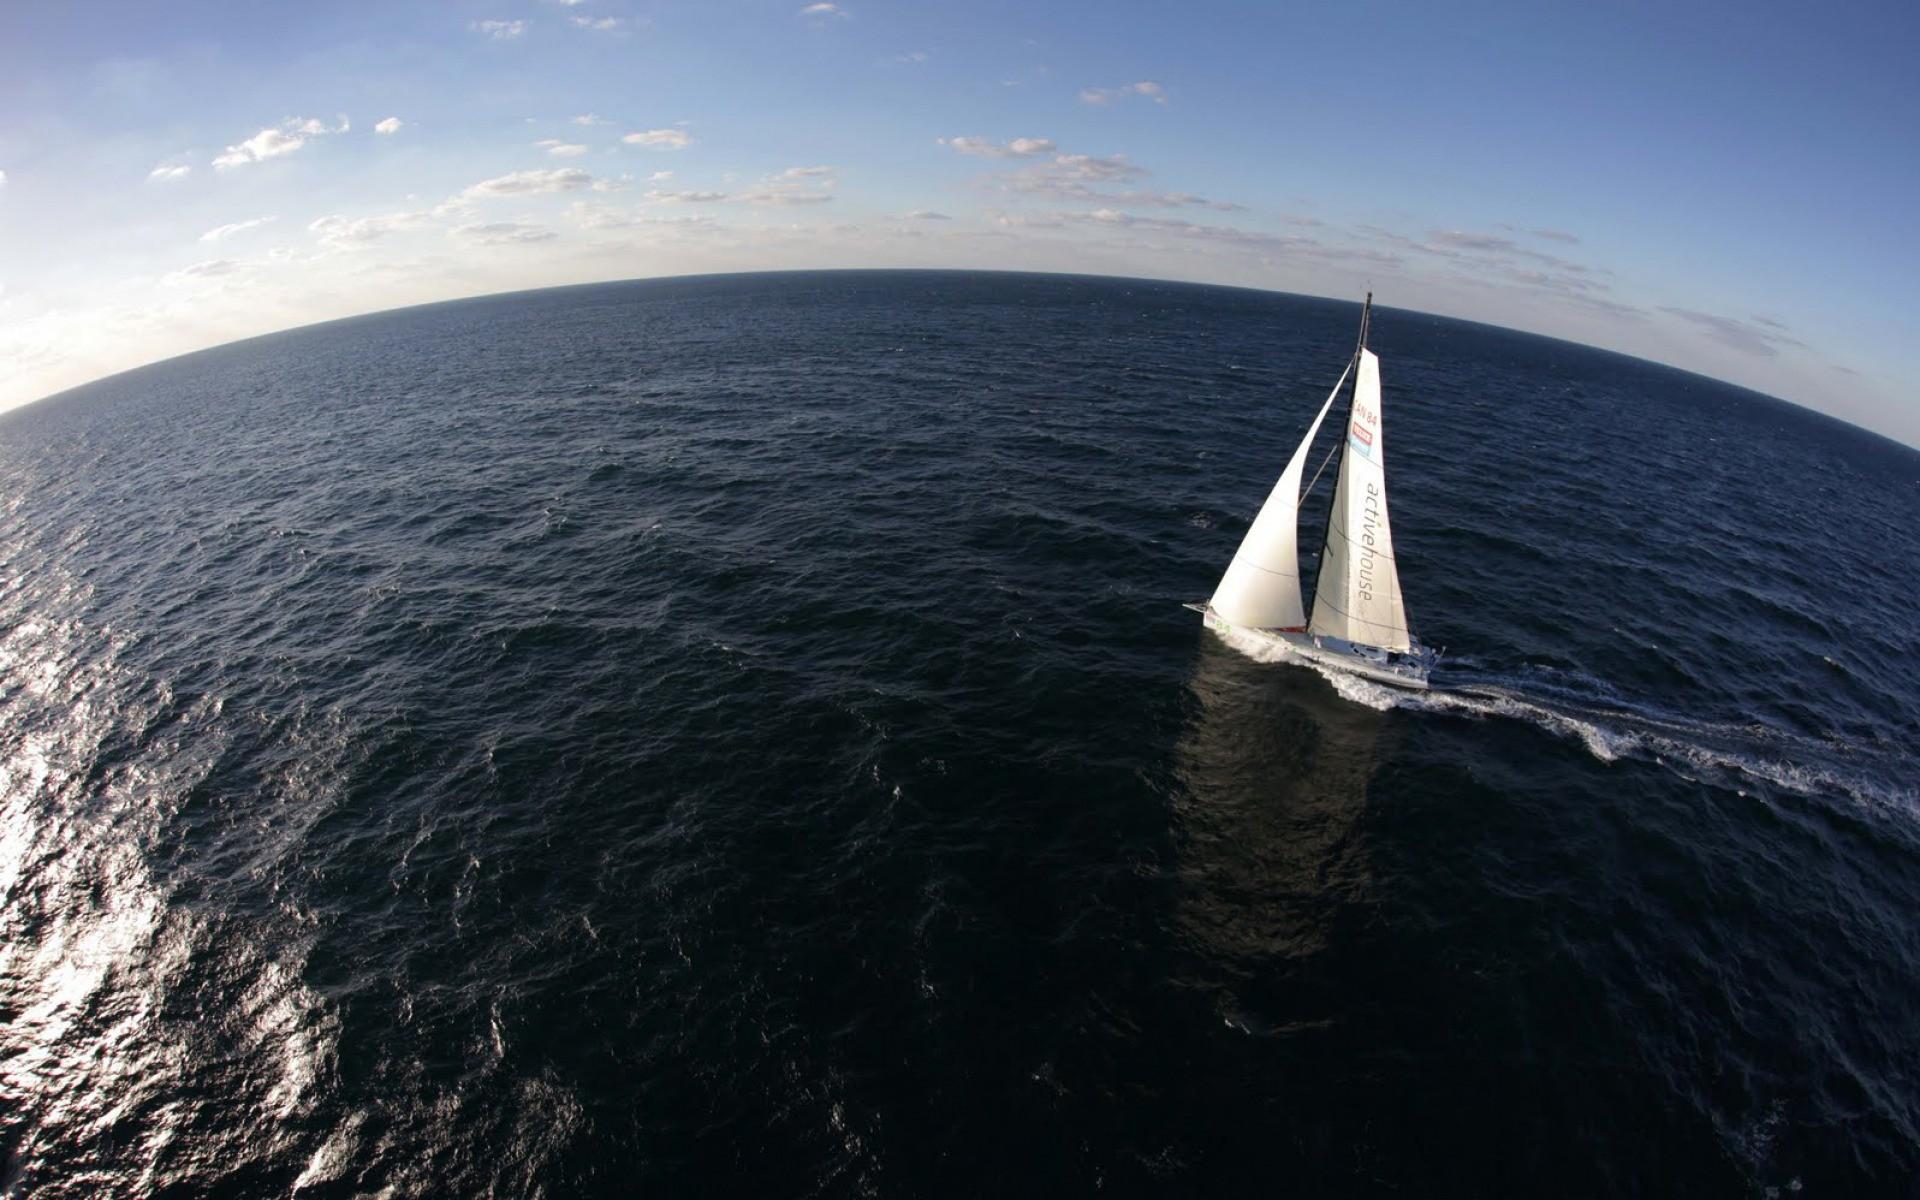 Ships_Yacht_in_the_vast_ocean_104010_.jpg